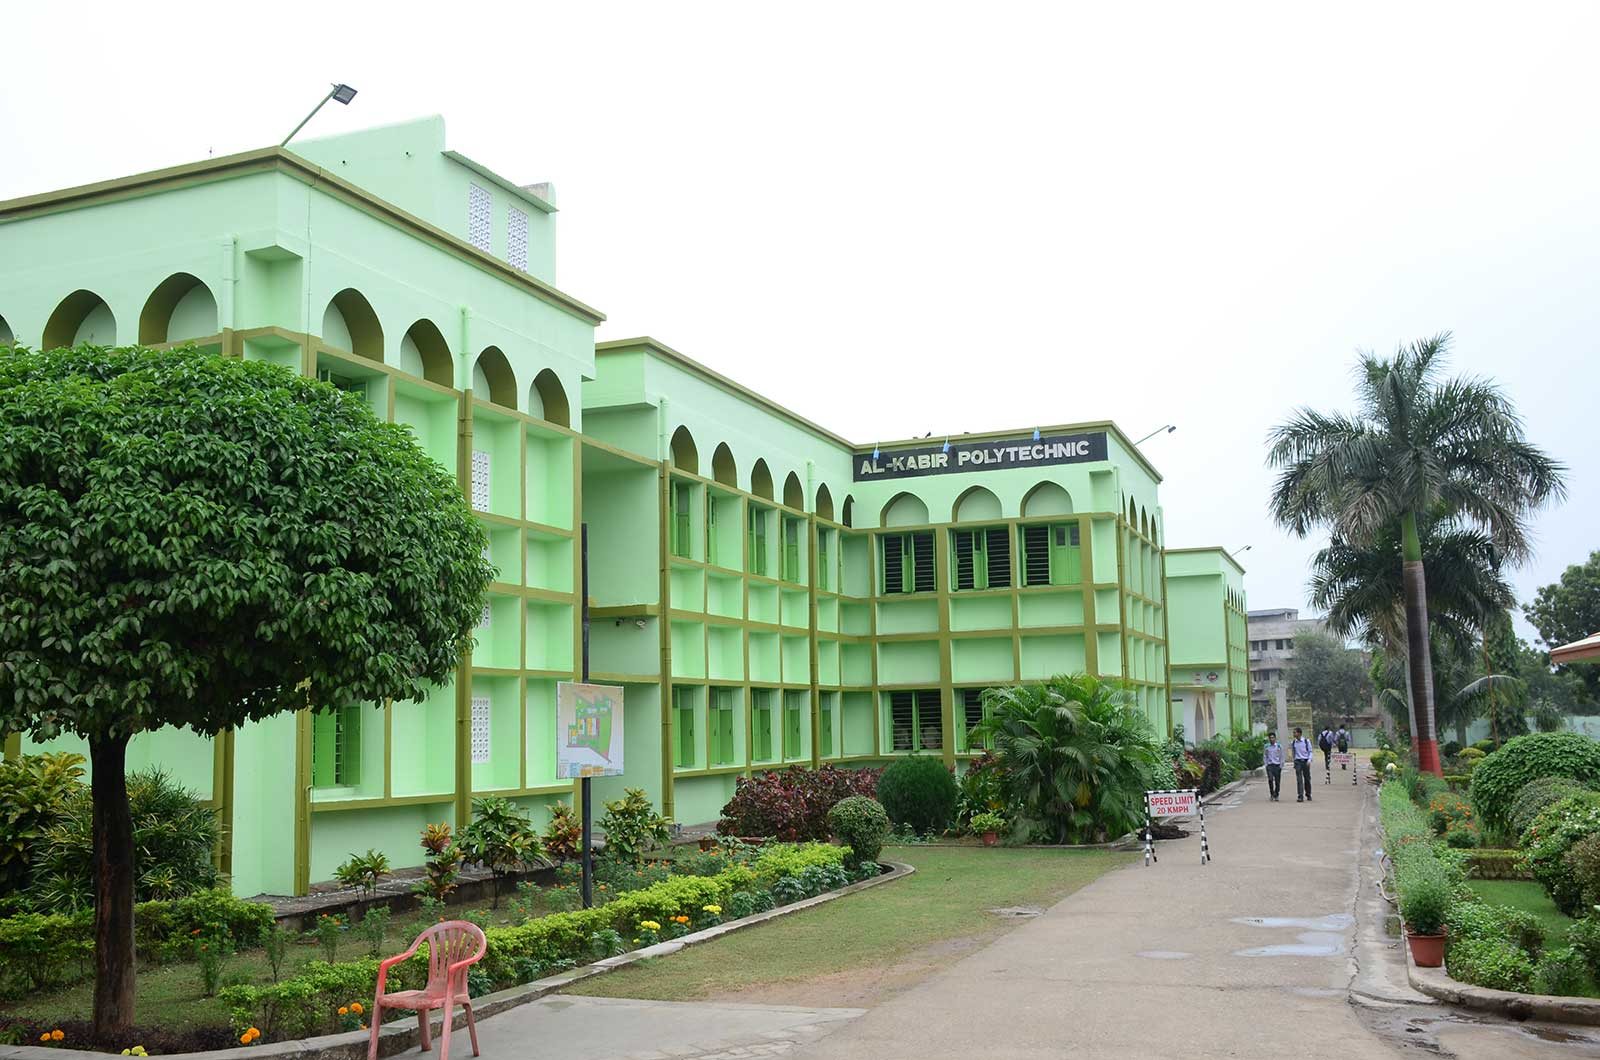 Al-Kabir Polytechnic